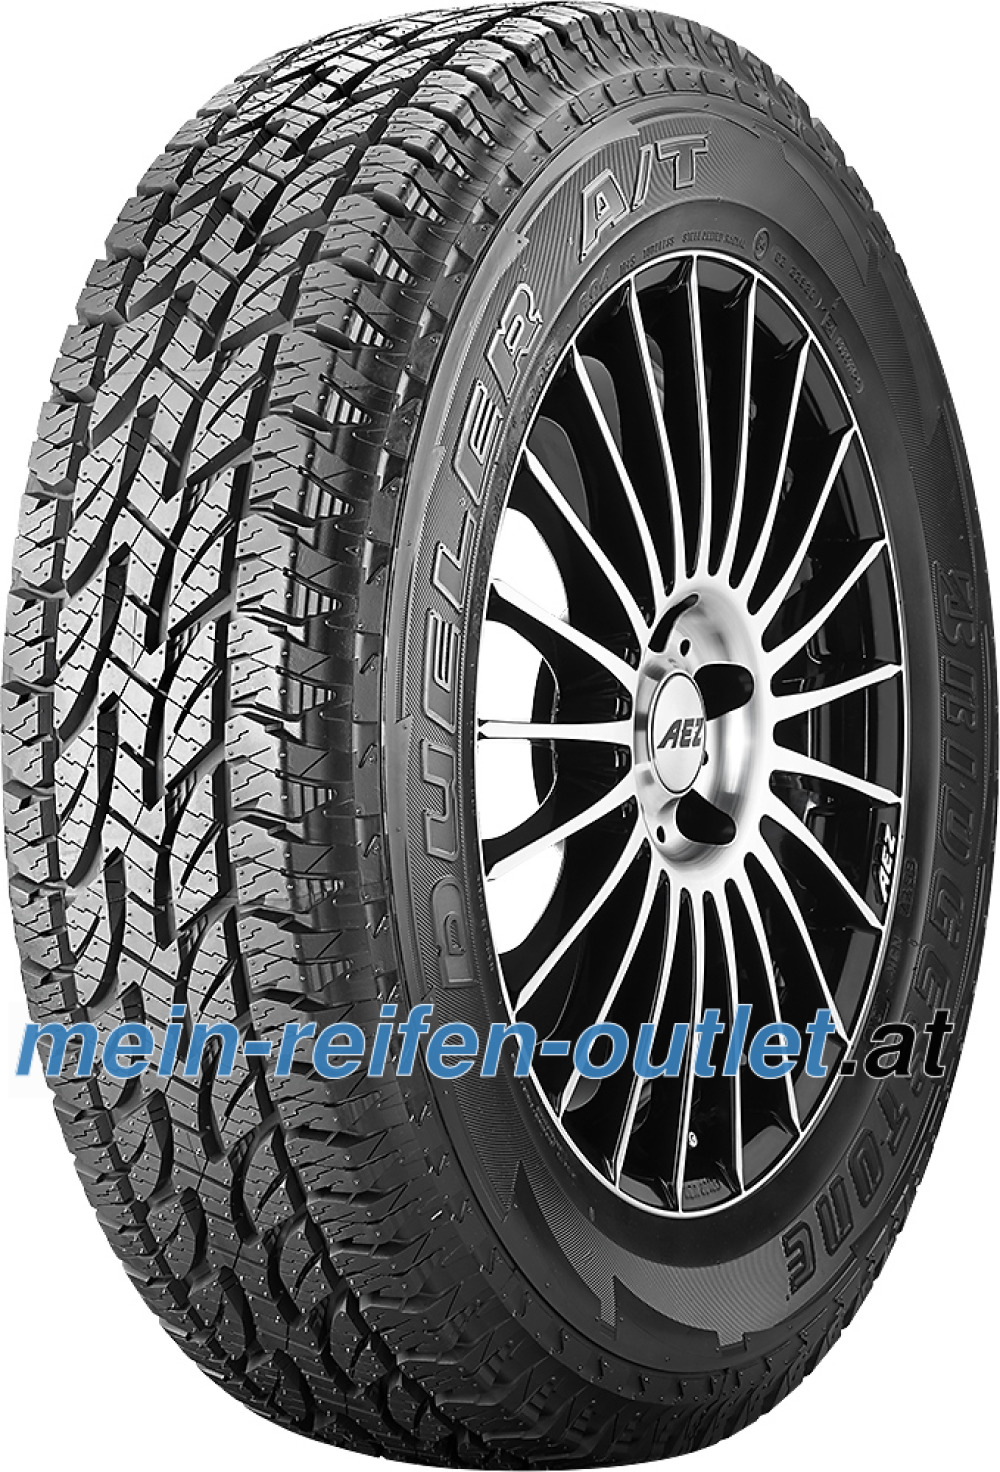 Bridgestone Dueler A/T 694 ( 255/70 R16 111S RBL )